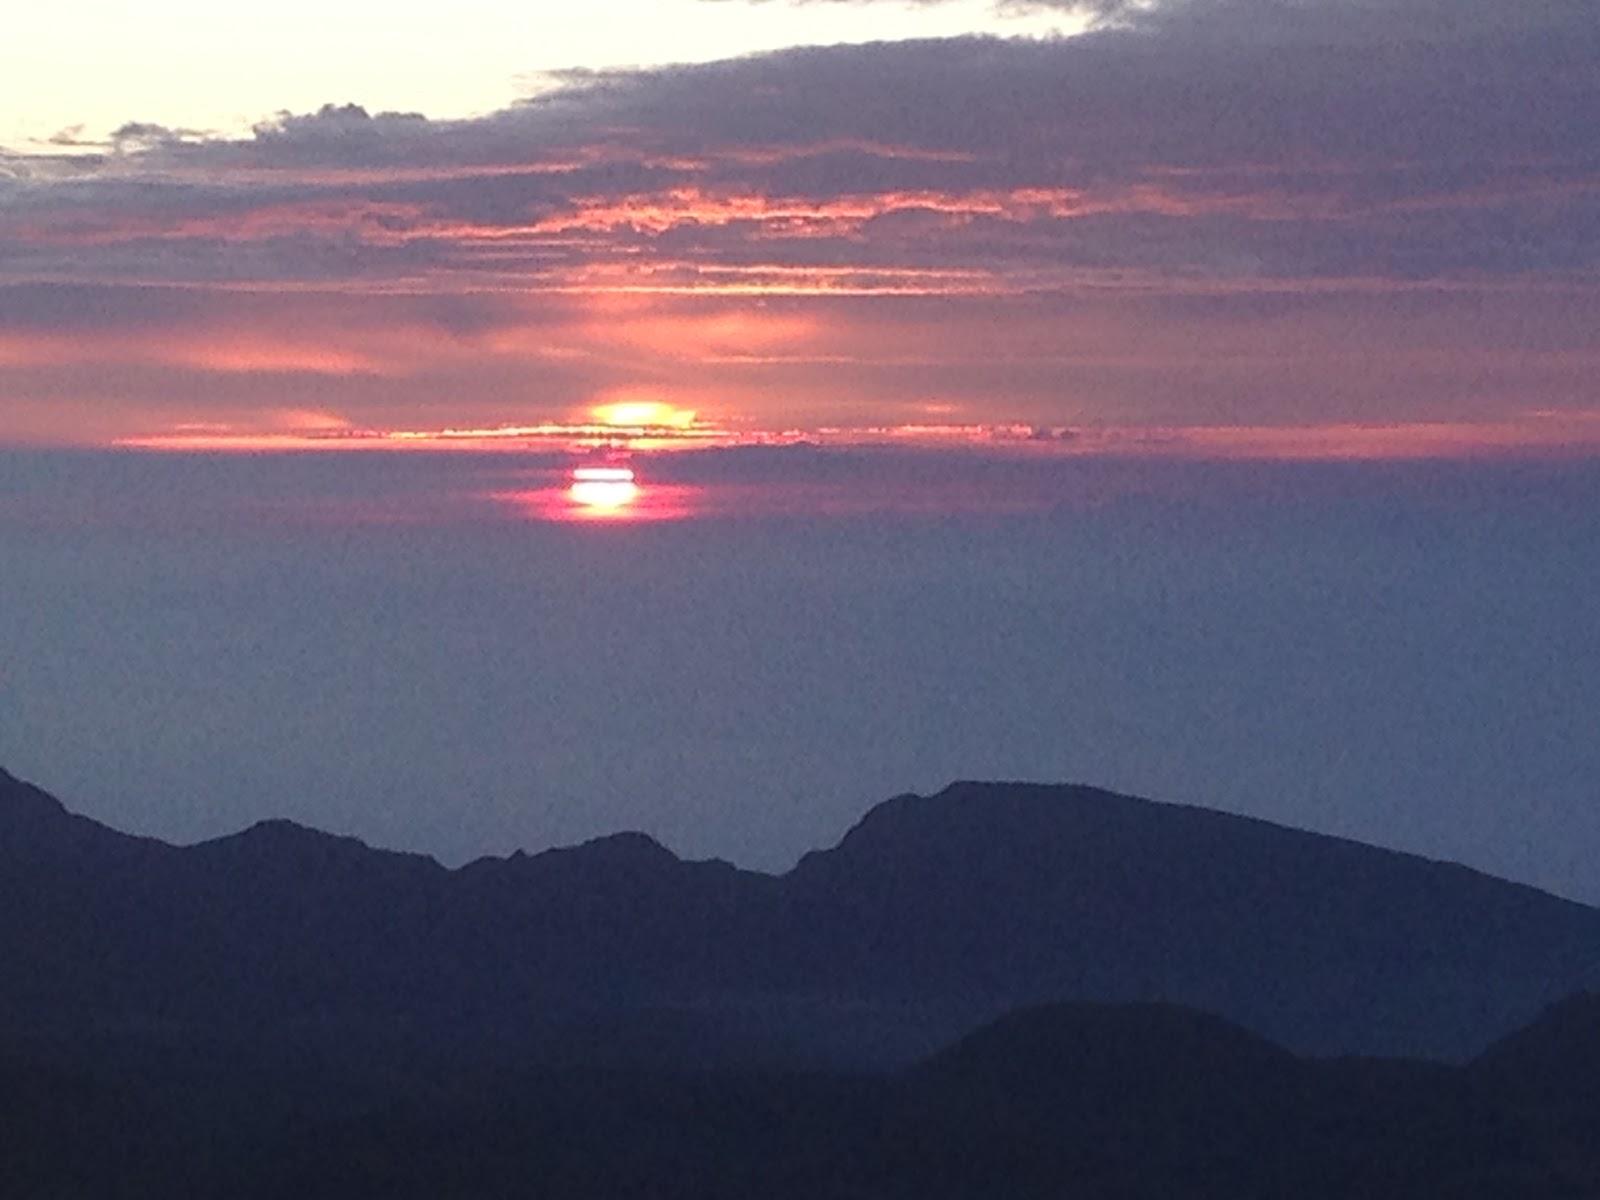 View of sunrise on Haleakala Volcano Summit